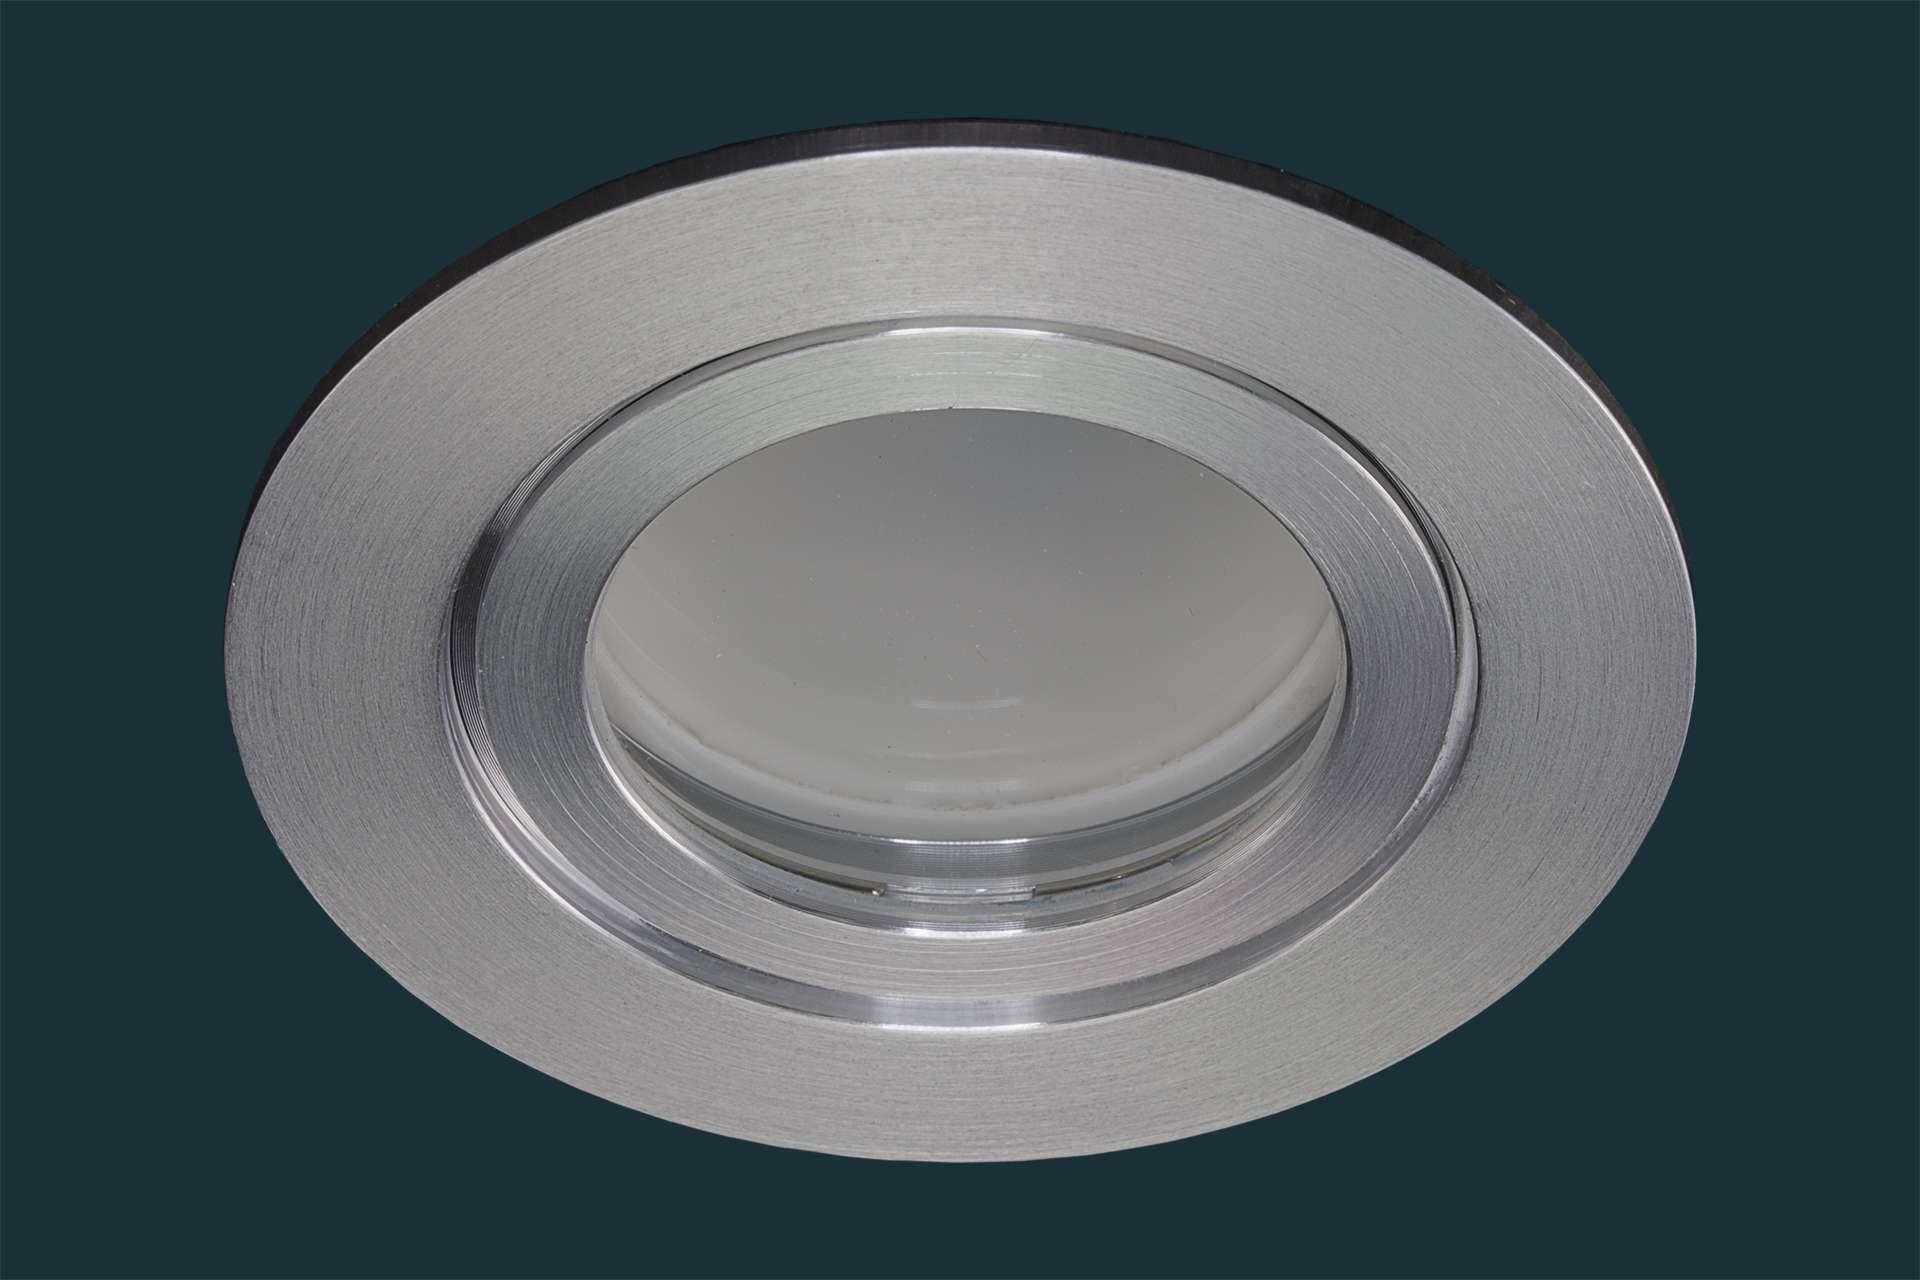 led-einbaustrahler-ip44-flach-dimmbar-aluminium-01_1280x1280@2x Wunderschöne Led Einbaustrahler Dimmbar Dekorationen